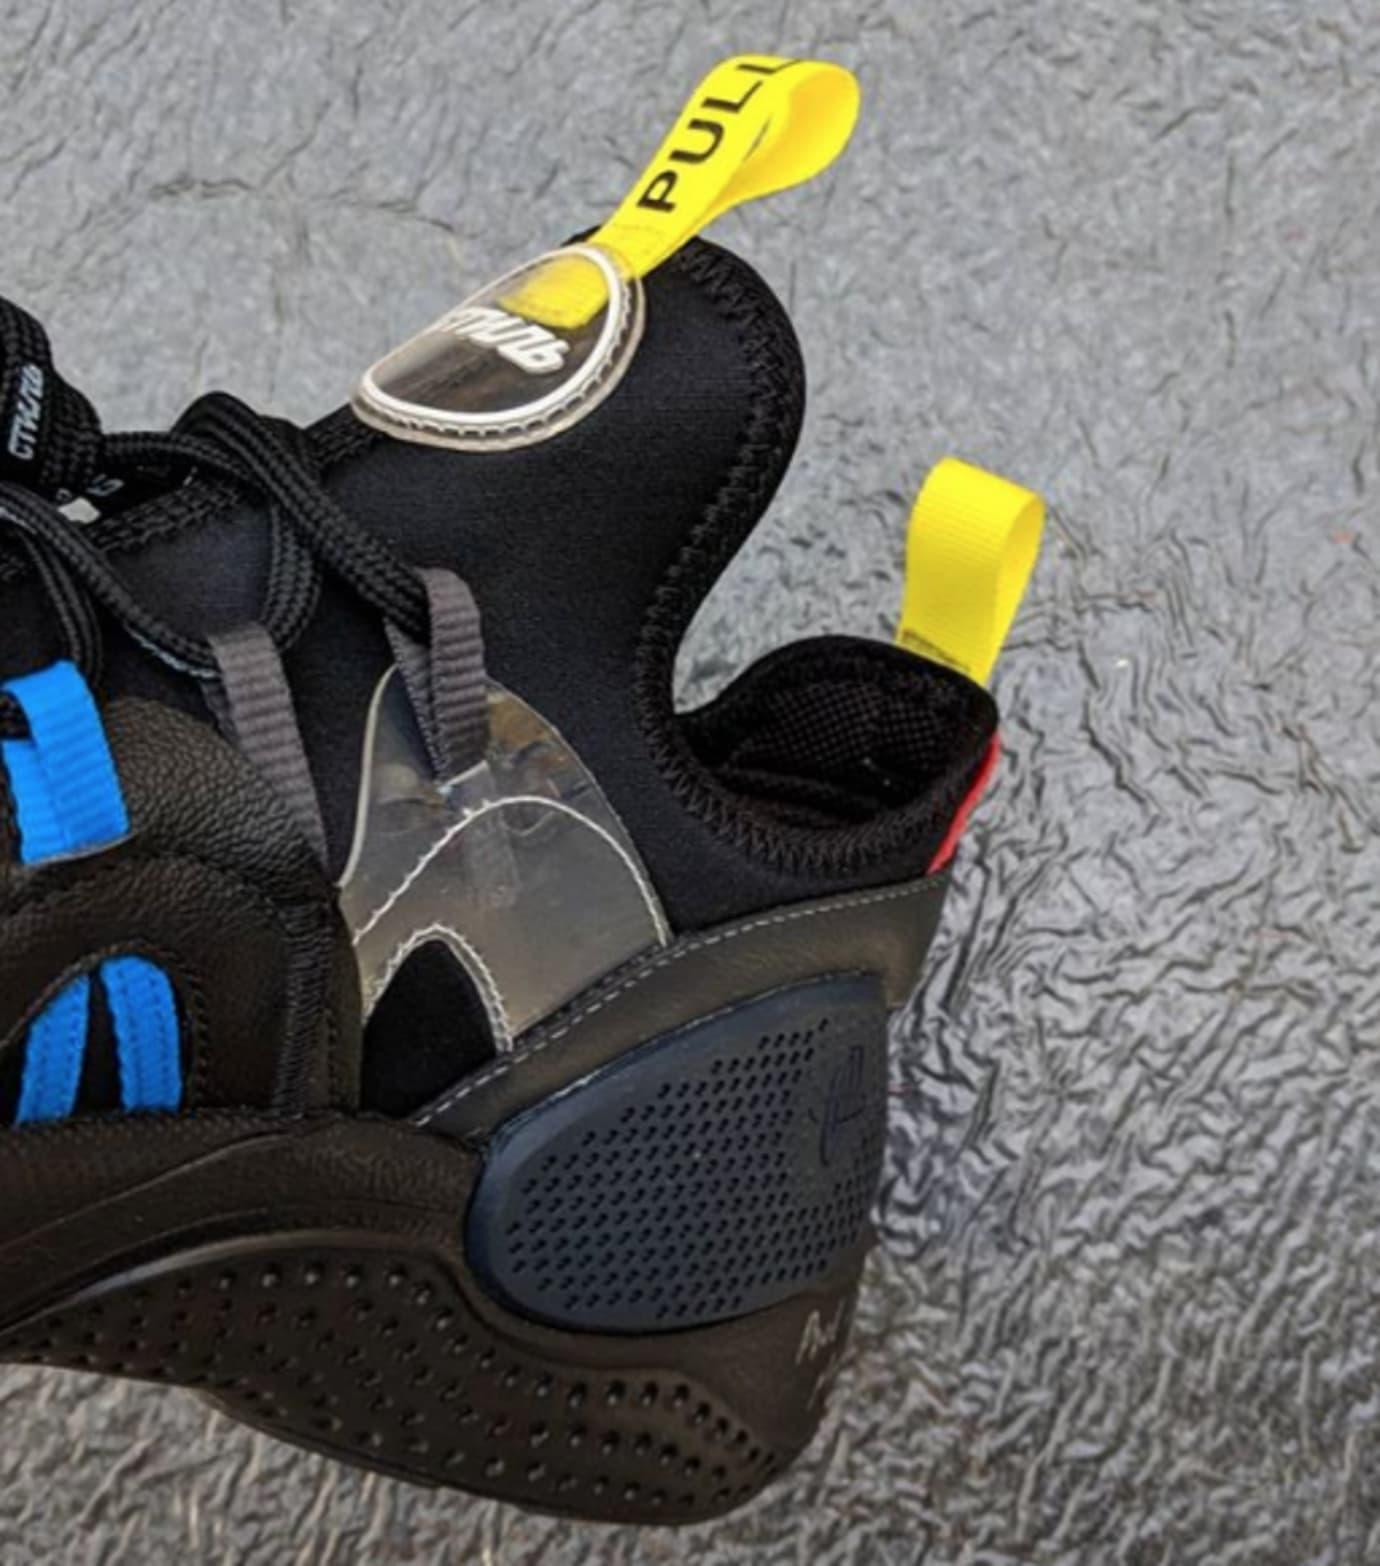 Heron Preston x Nike Huarache EDGE 'Black' (Medial Detail)